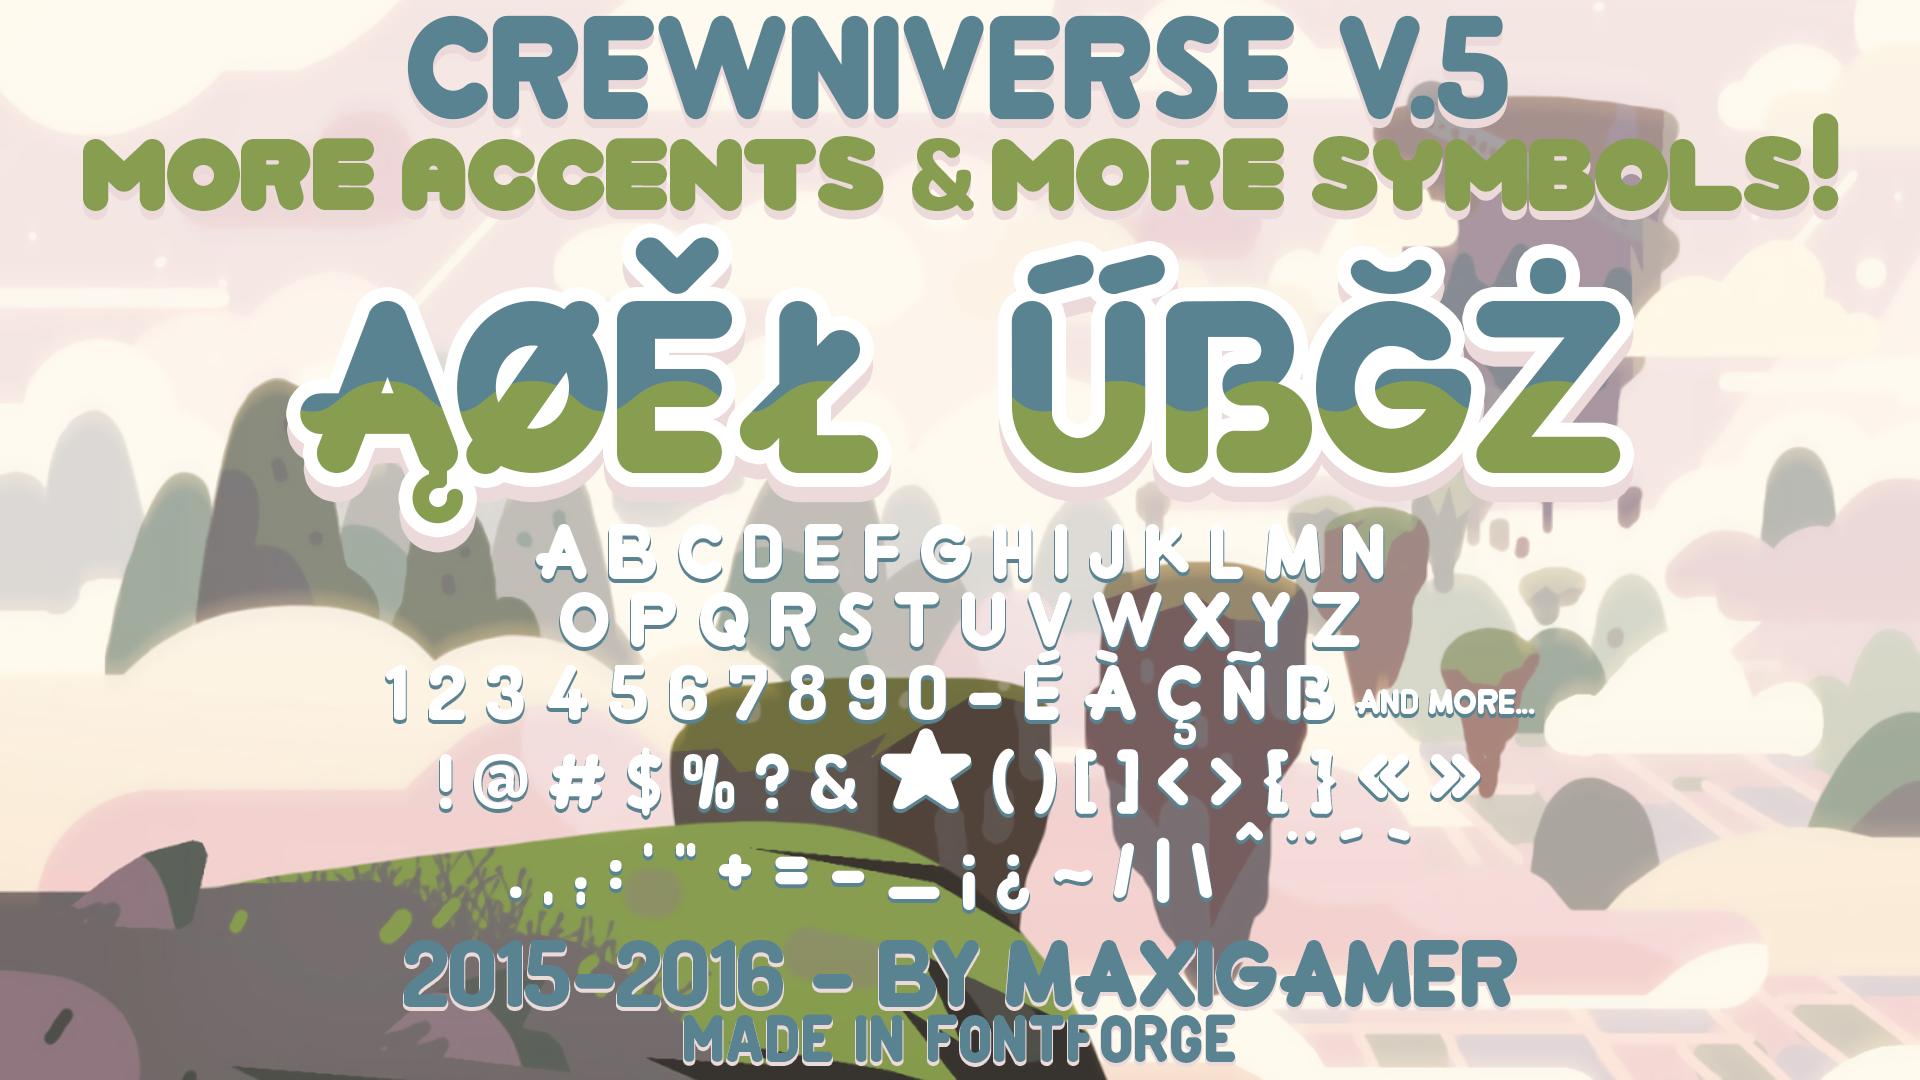 Crewniverse Font V.5 (MORE ACCENTS AND SYMBOLS!)